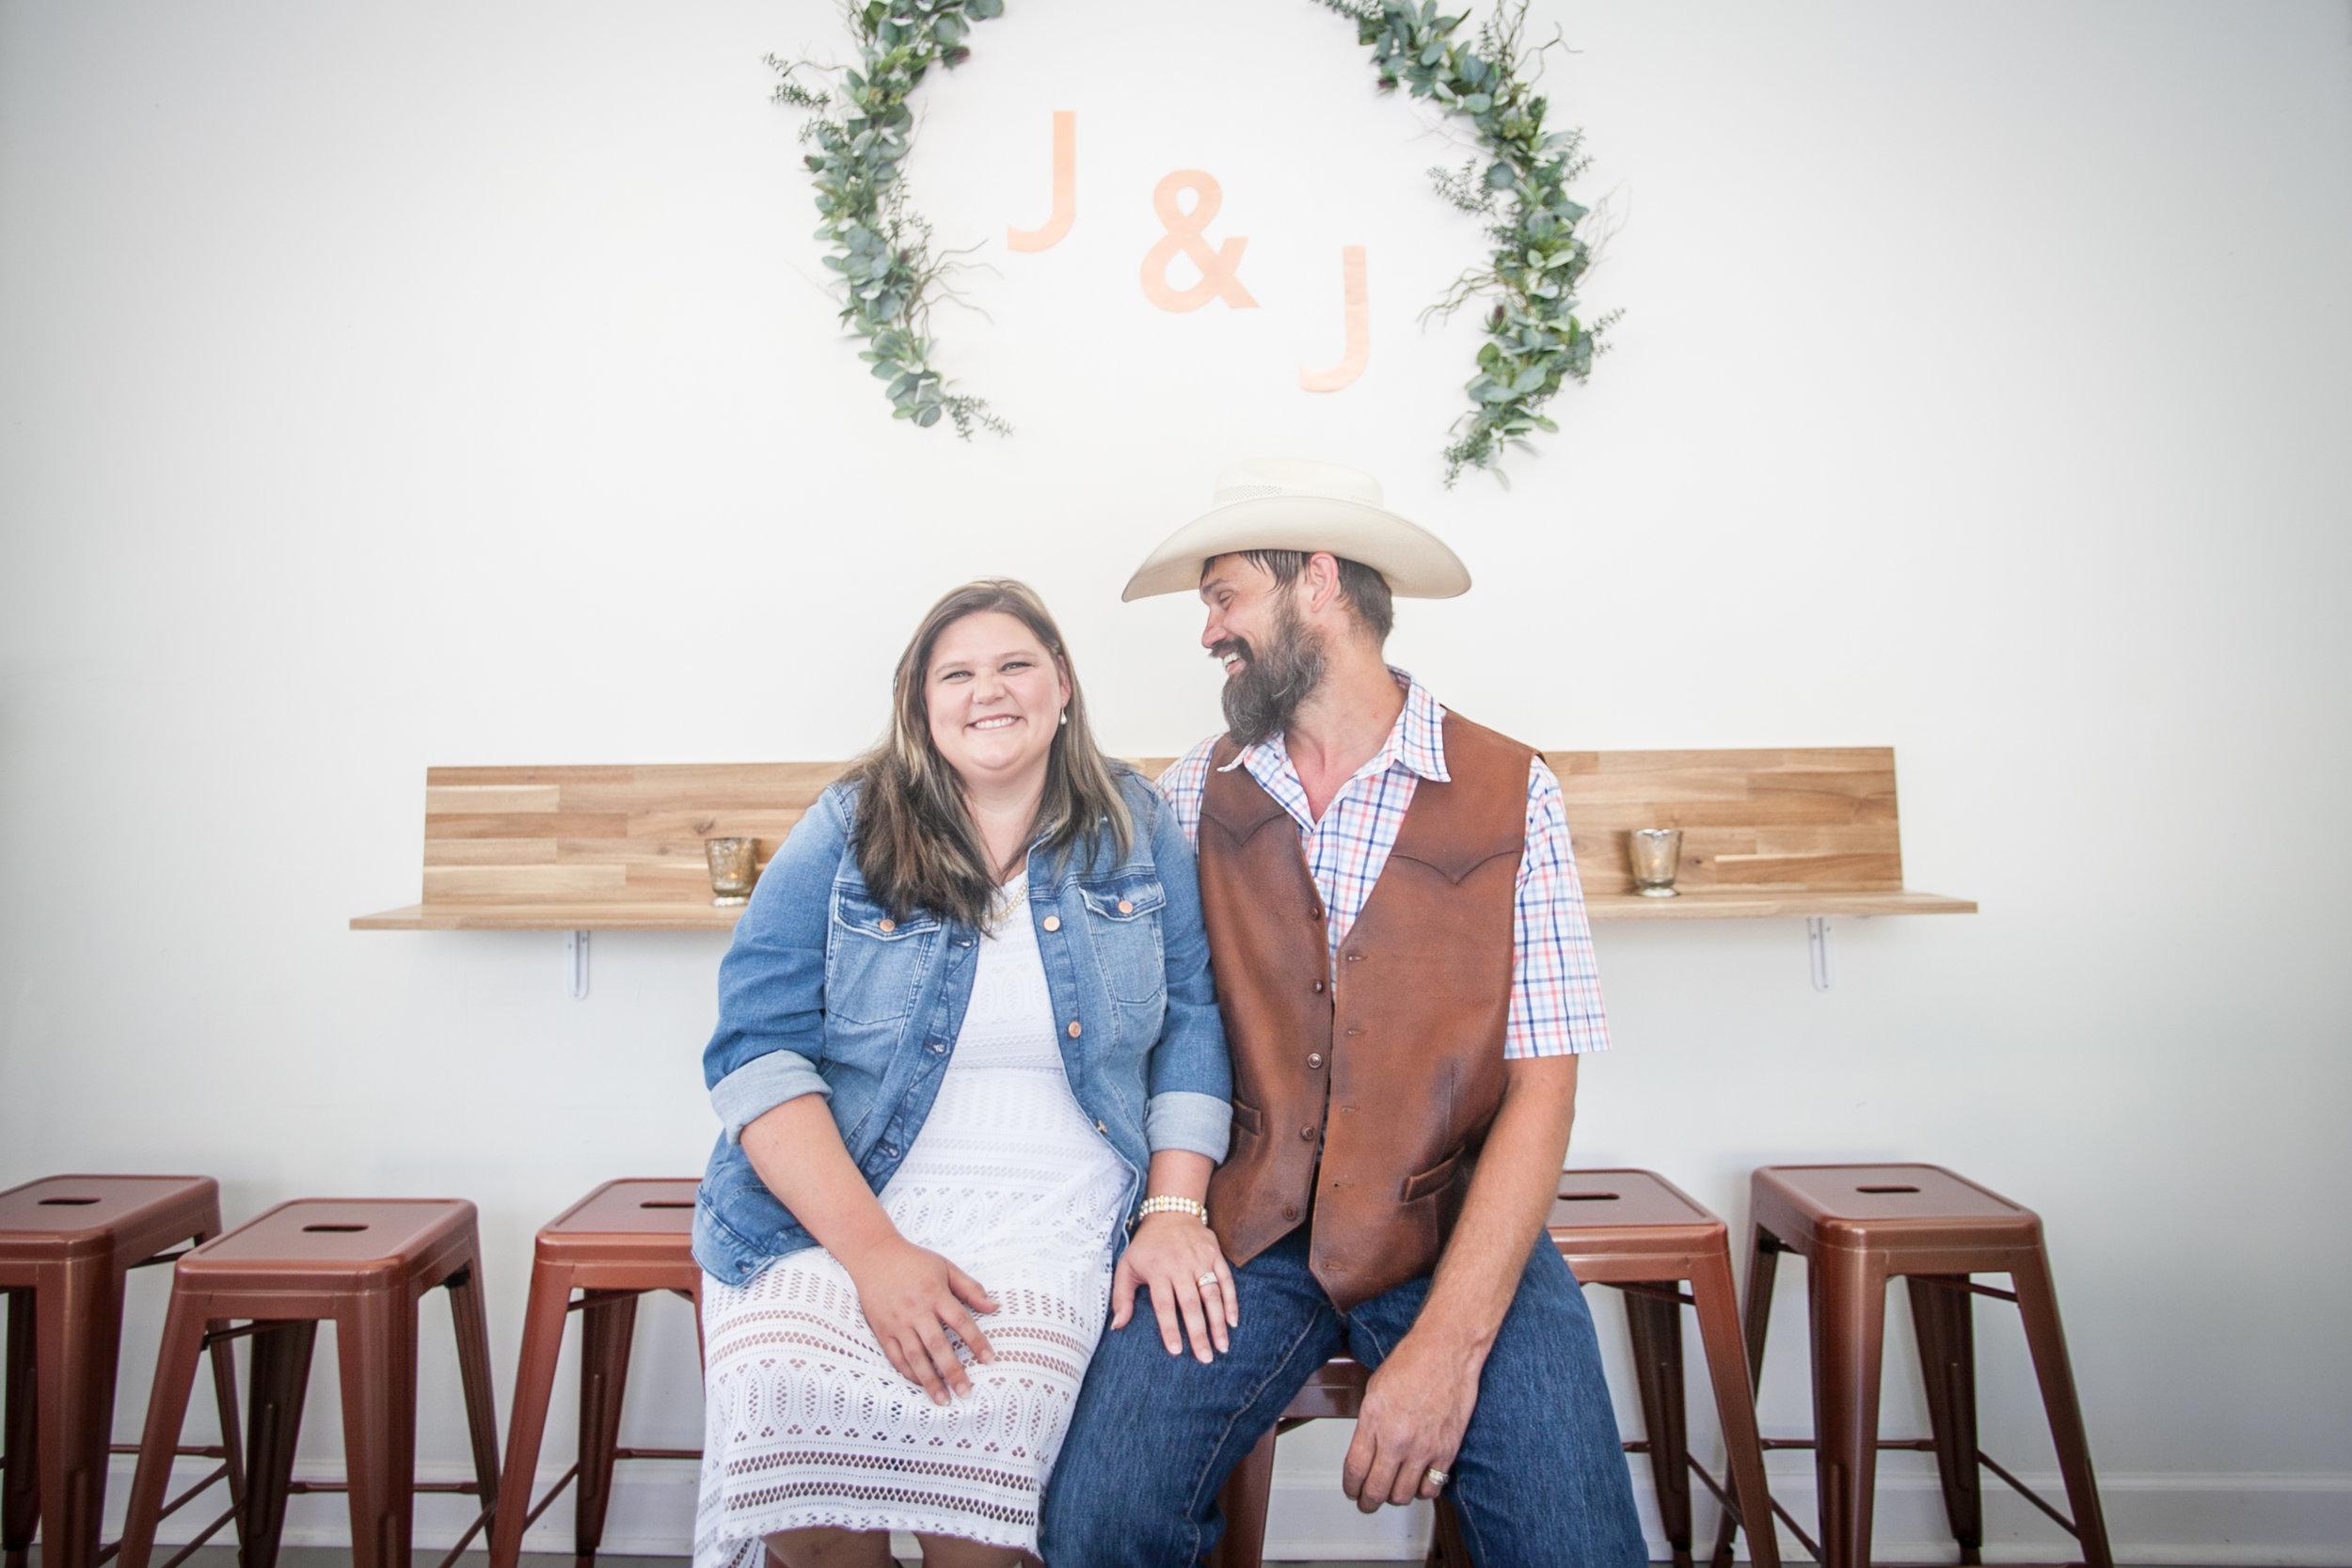 Kansas_City_Small_Wedding_Venue_Elope_Intimate_Ceremony_Budget_Affordable_Wedding Day-113.jpg